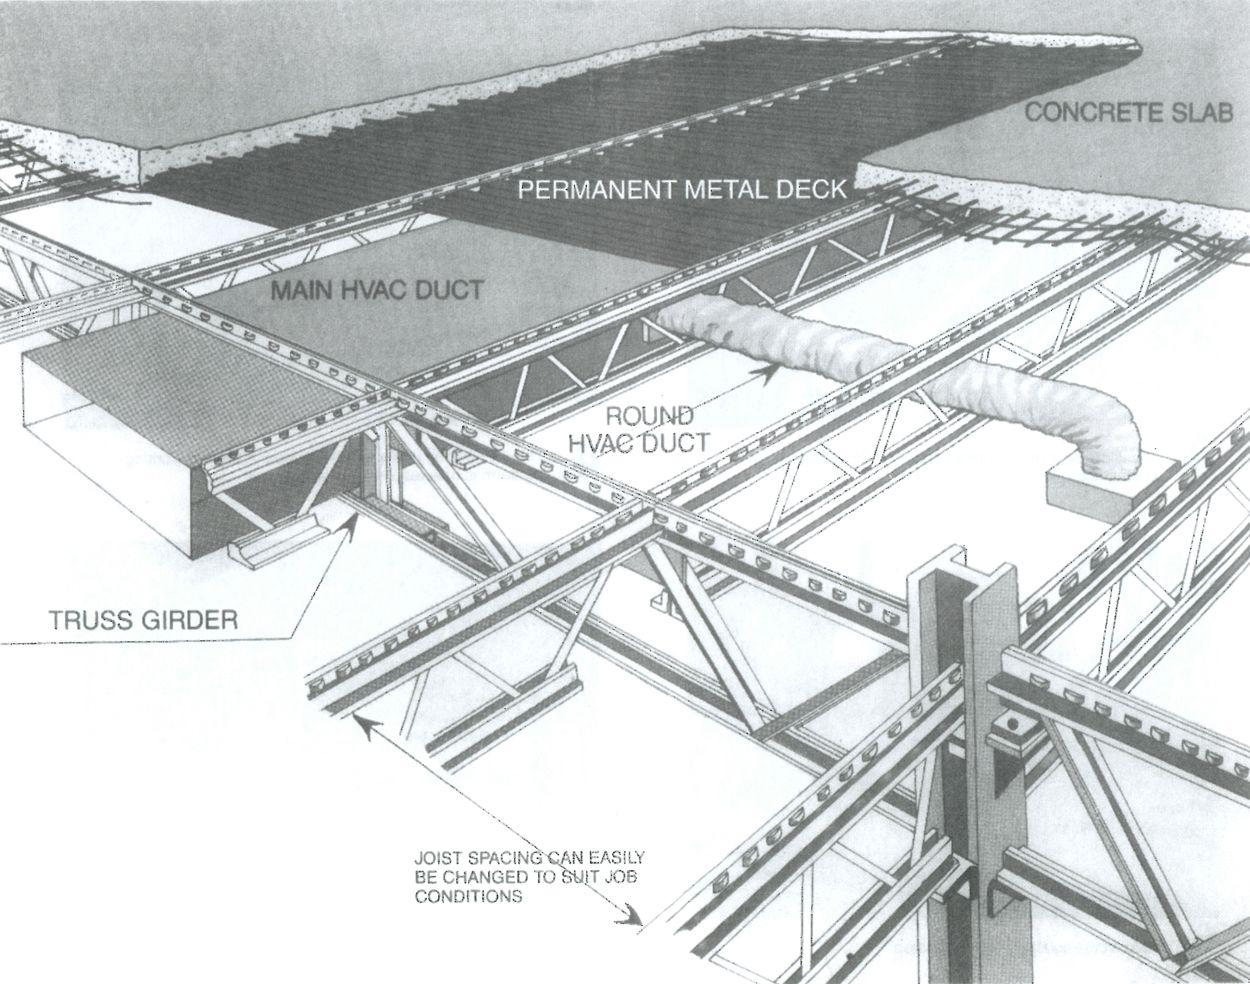 Steel Girder Truss Framing Construction Roof Trusses Steel Trusses